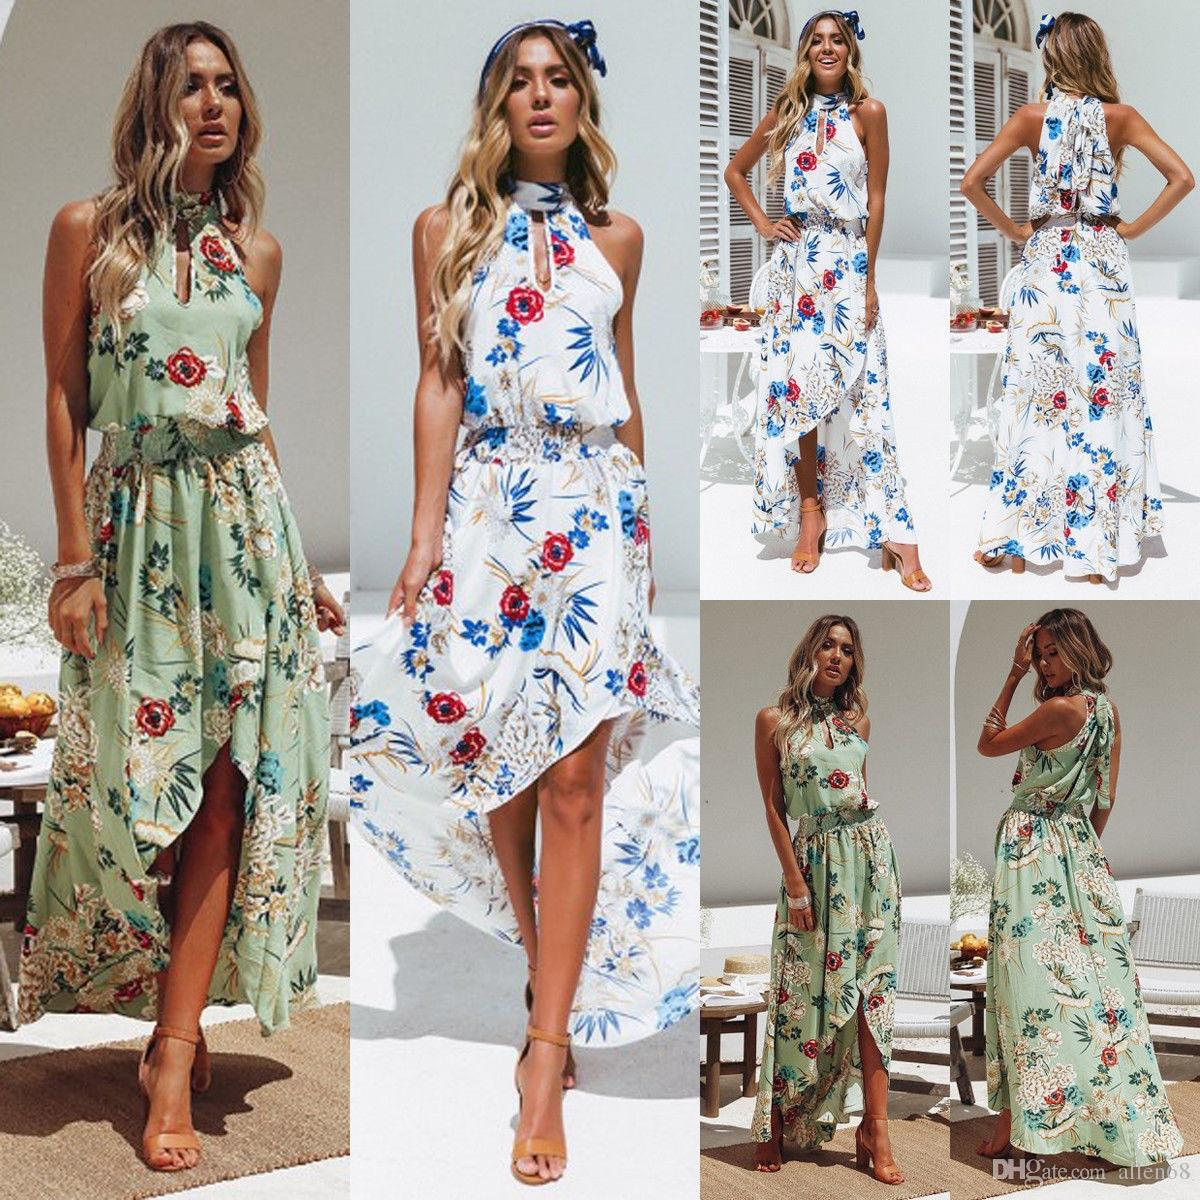 ce1aaa9a2b8b4 Maxi Long Dress 2019 Summer Dresses Women Floral Print Boho Dress Plus Size  2XL Sleeveless Beach Holiday Slip Dress female gowns